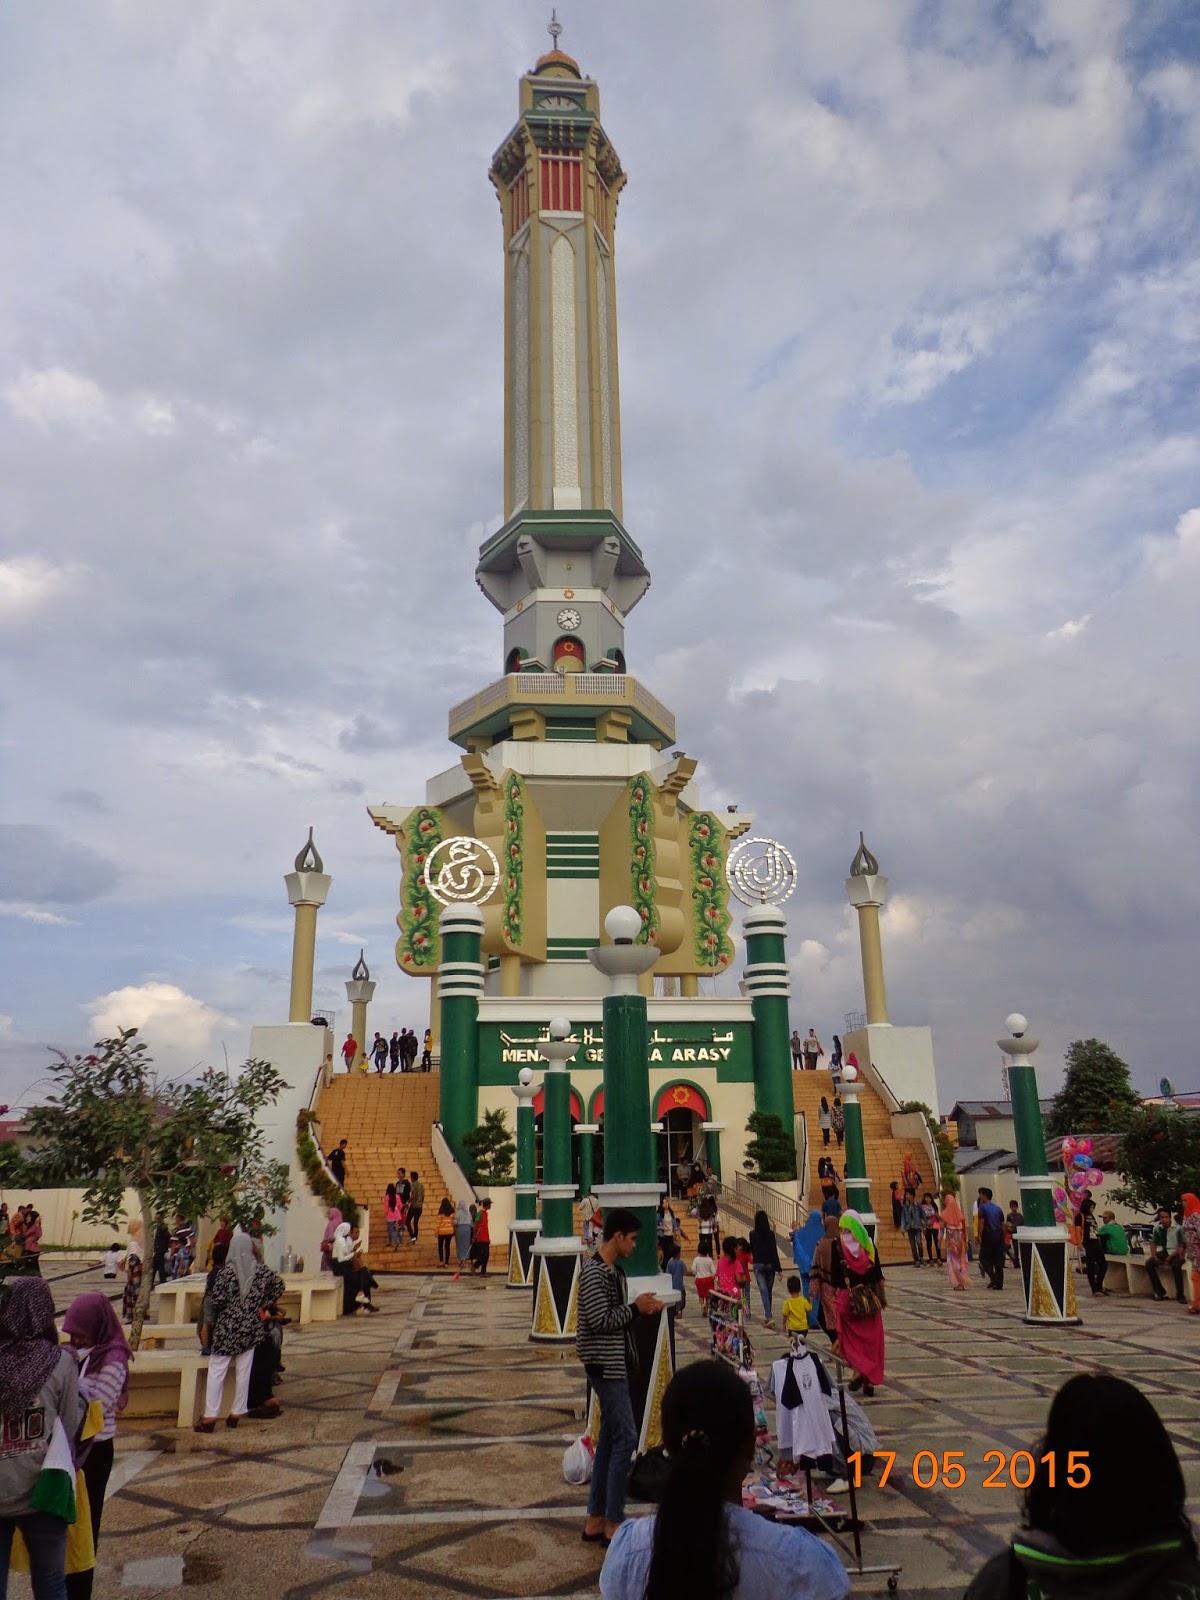 Blog Place Write Menara Gentala Arasy Ikon Kota Jambi